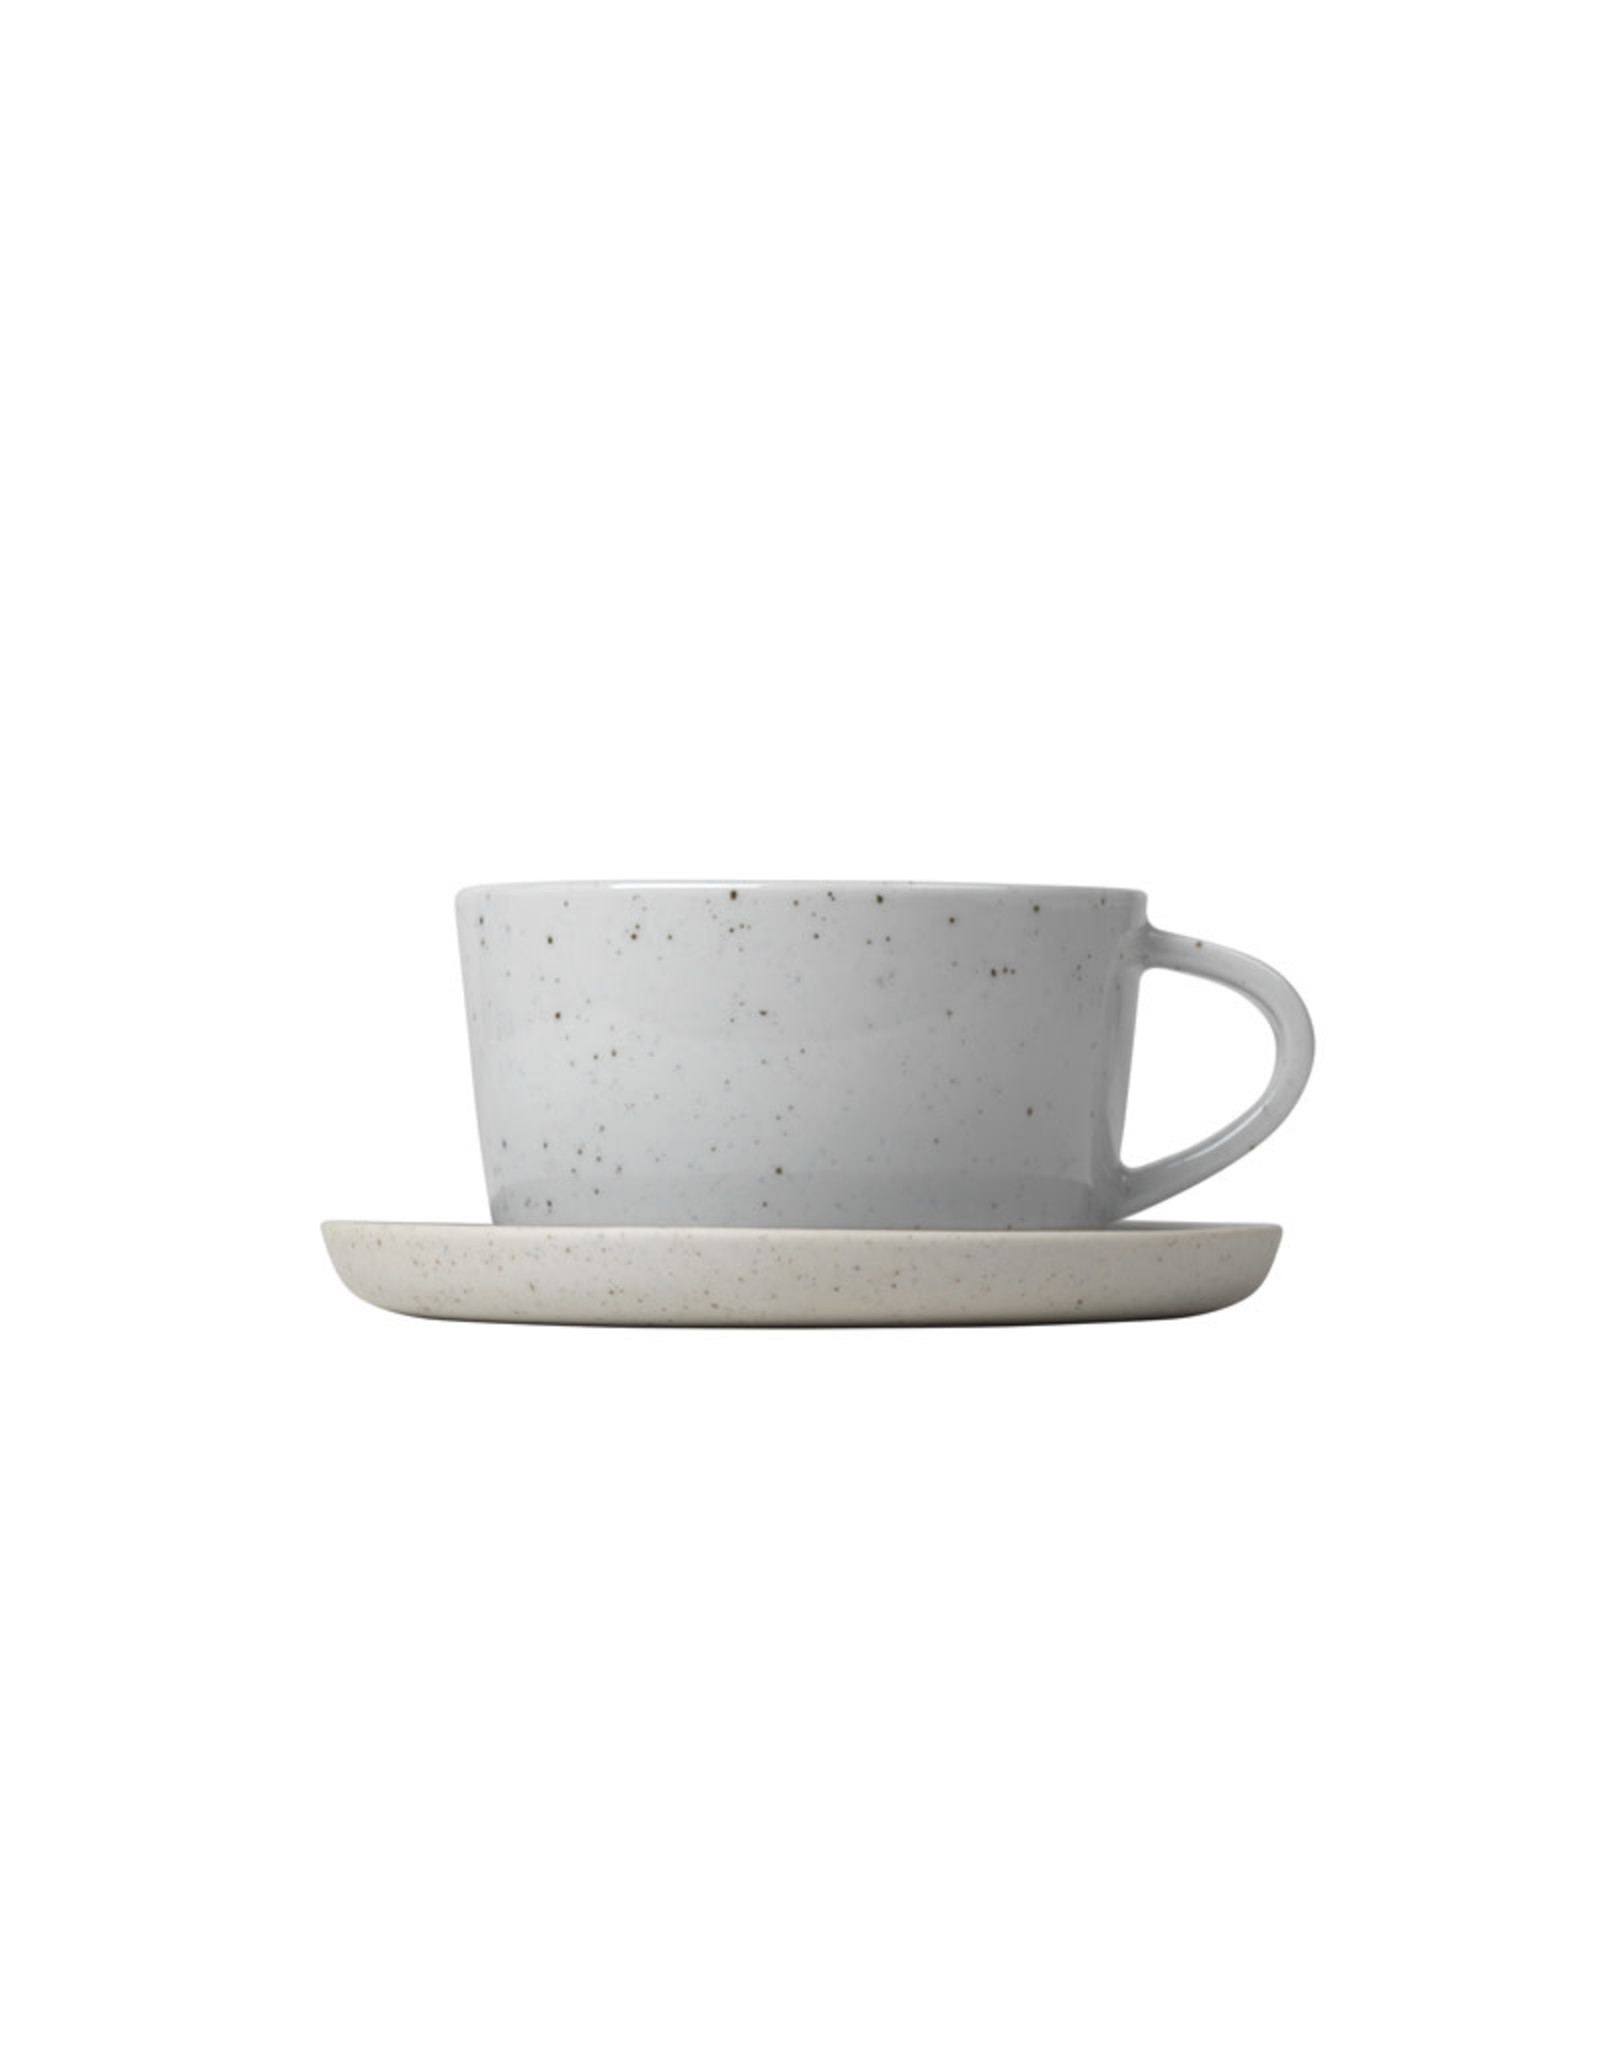 BLOMUS BLOMUS SABLO SET OF 2 COFFEE CUPS